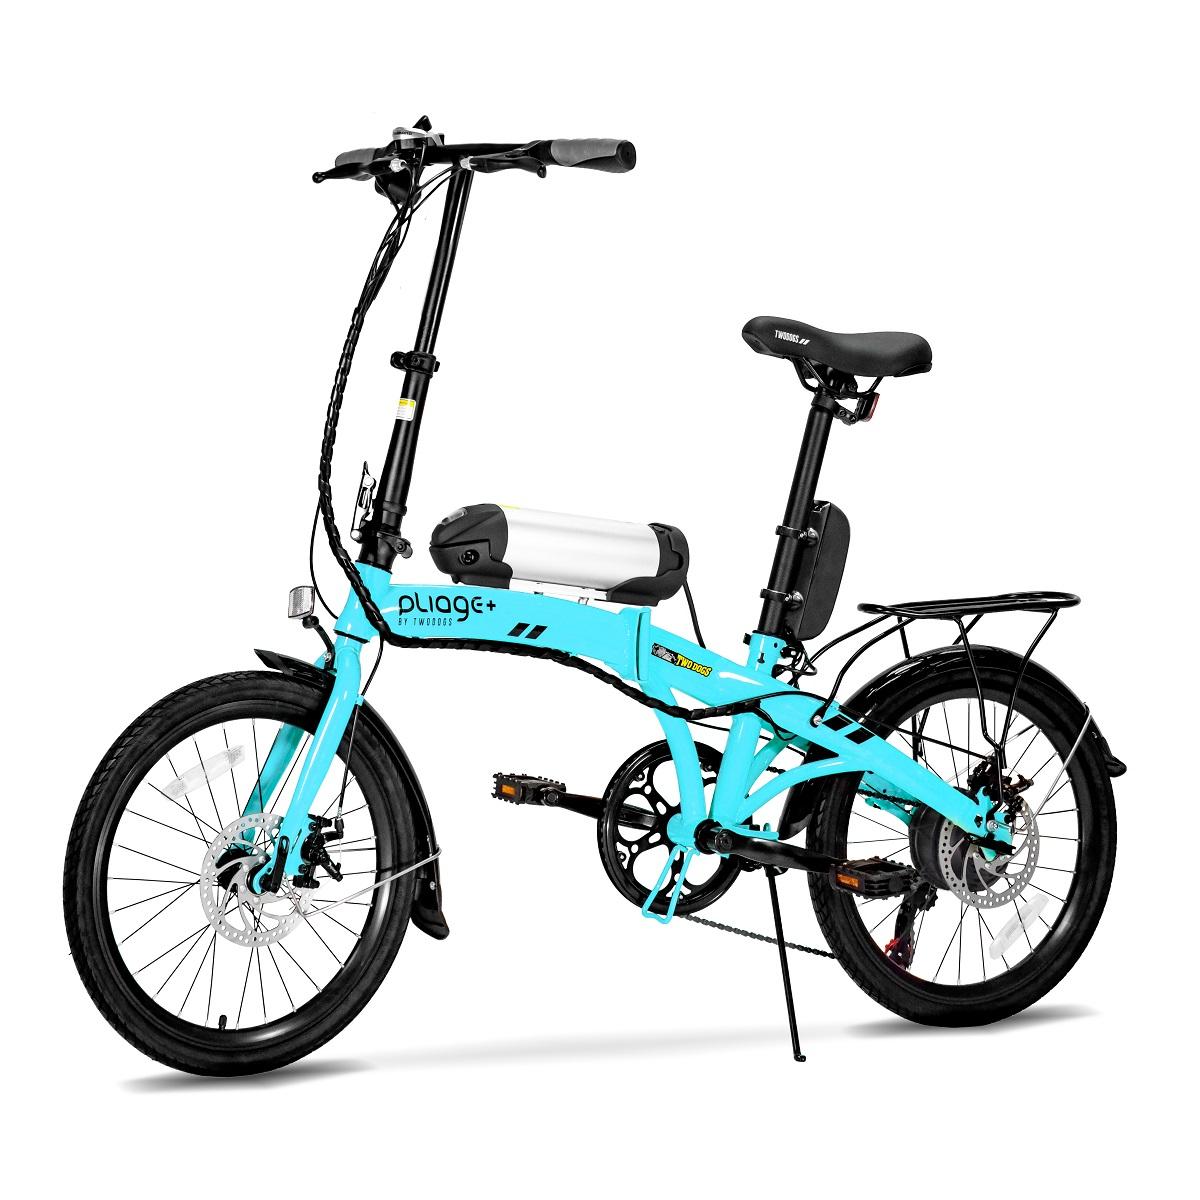 Bicicleta Dobrável Pliage Elétrica 350w Two Dogs Shimano 7v